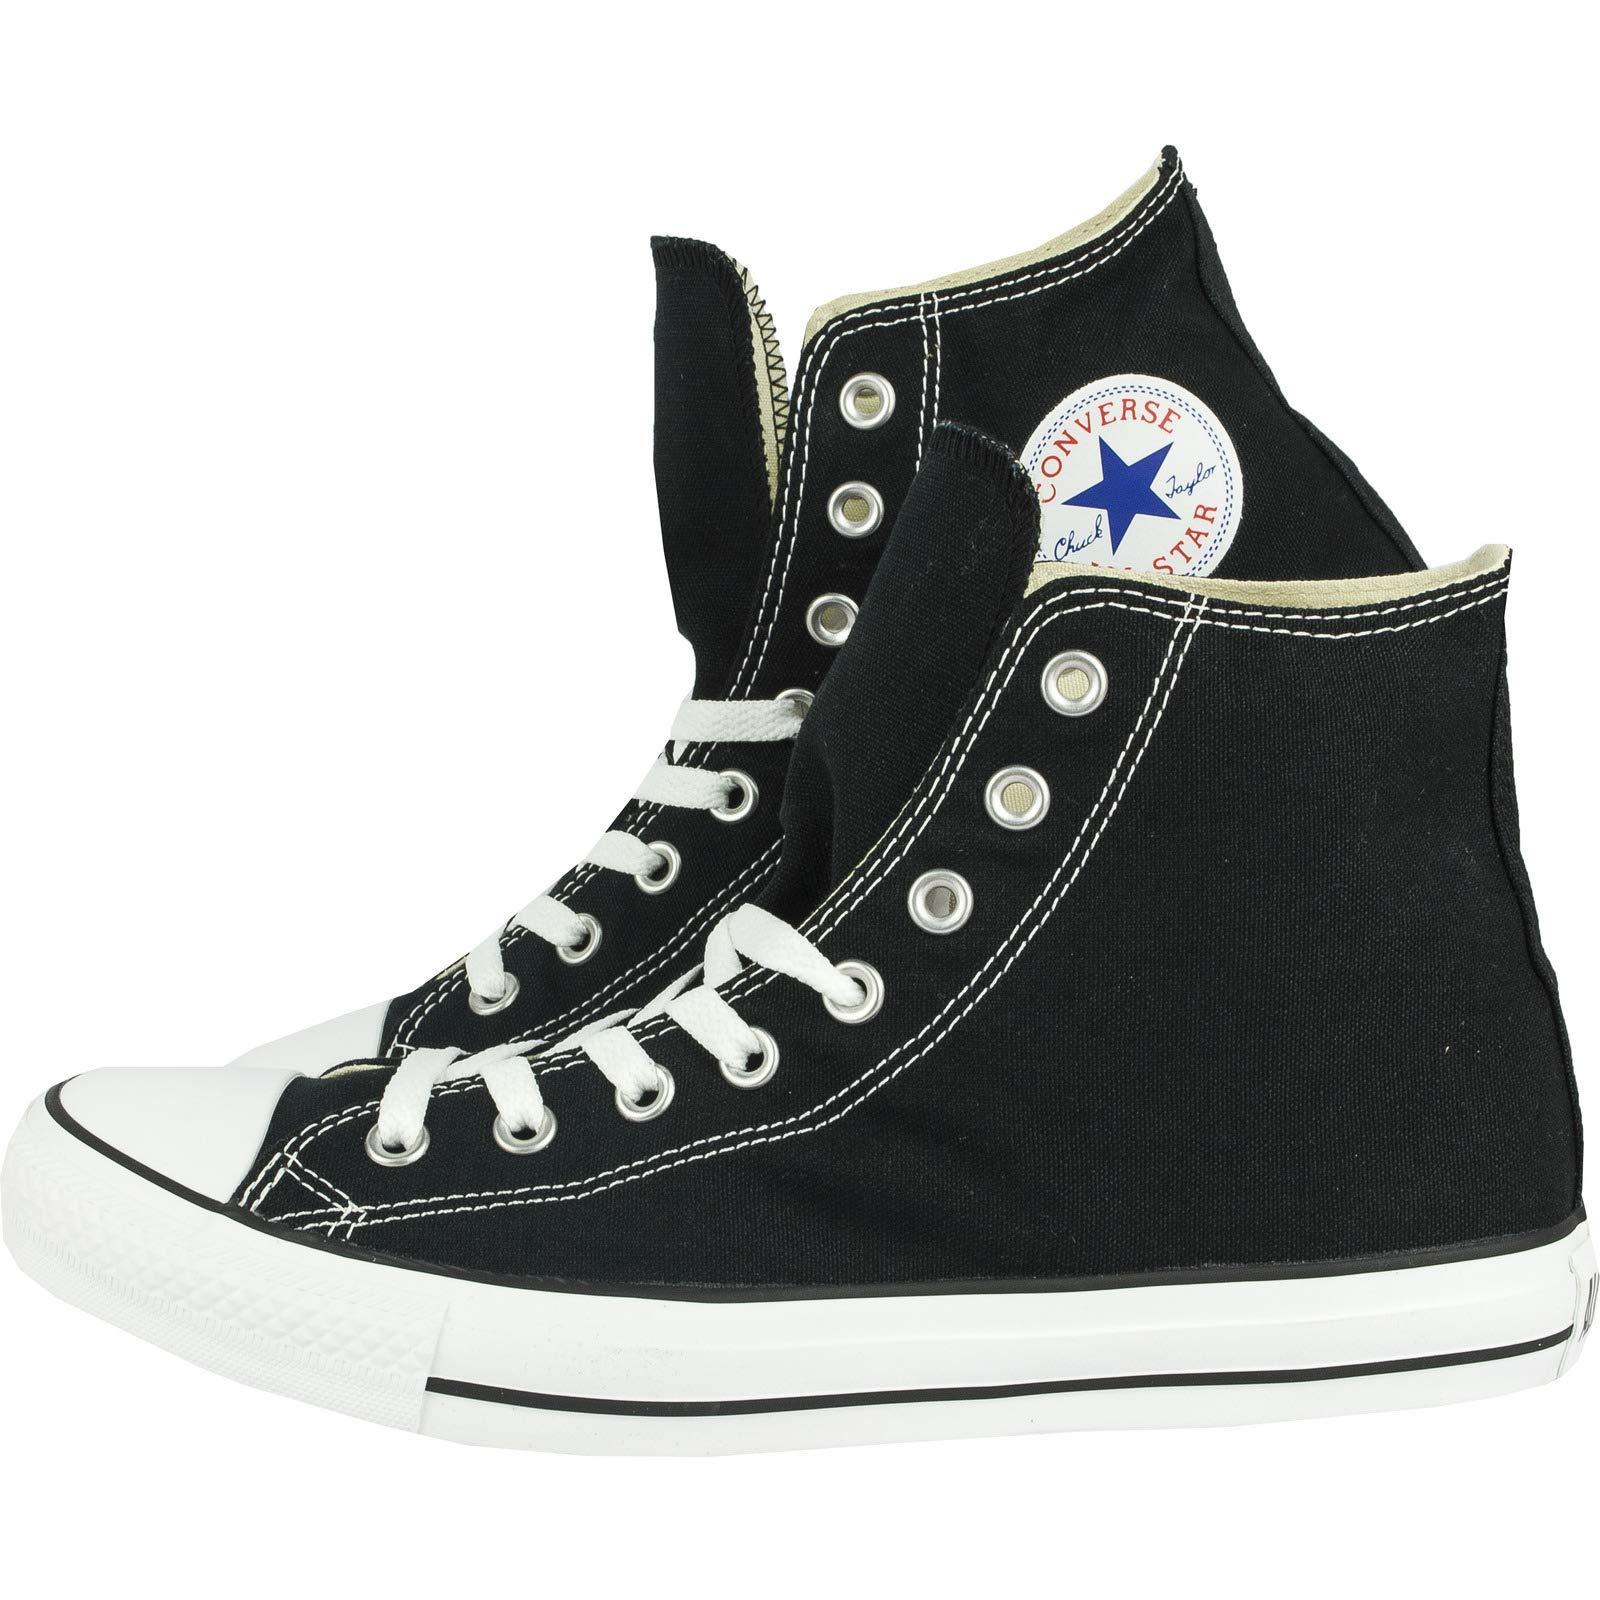 de076868c60 Galleon - Converse Chuck Taylor All Star Hi Shoe - Women s Black